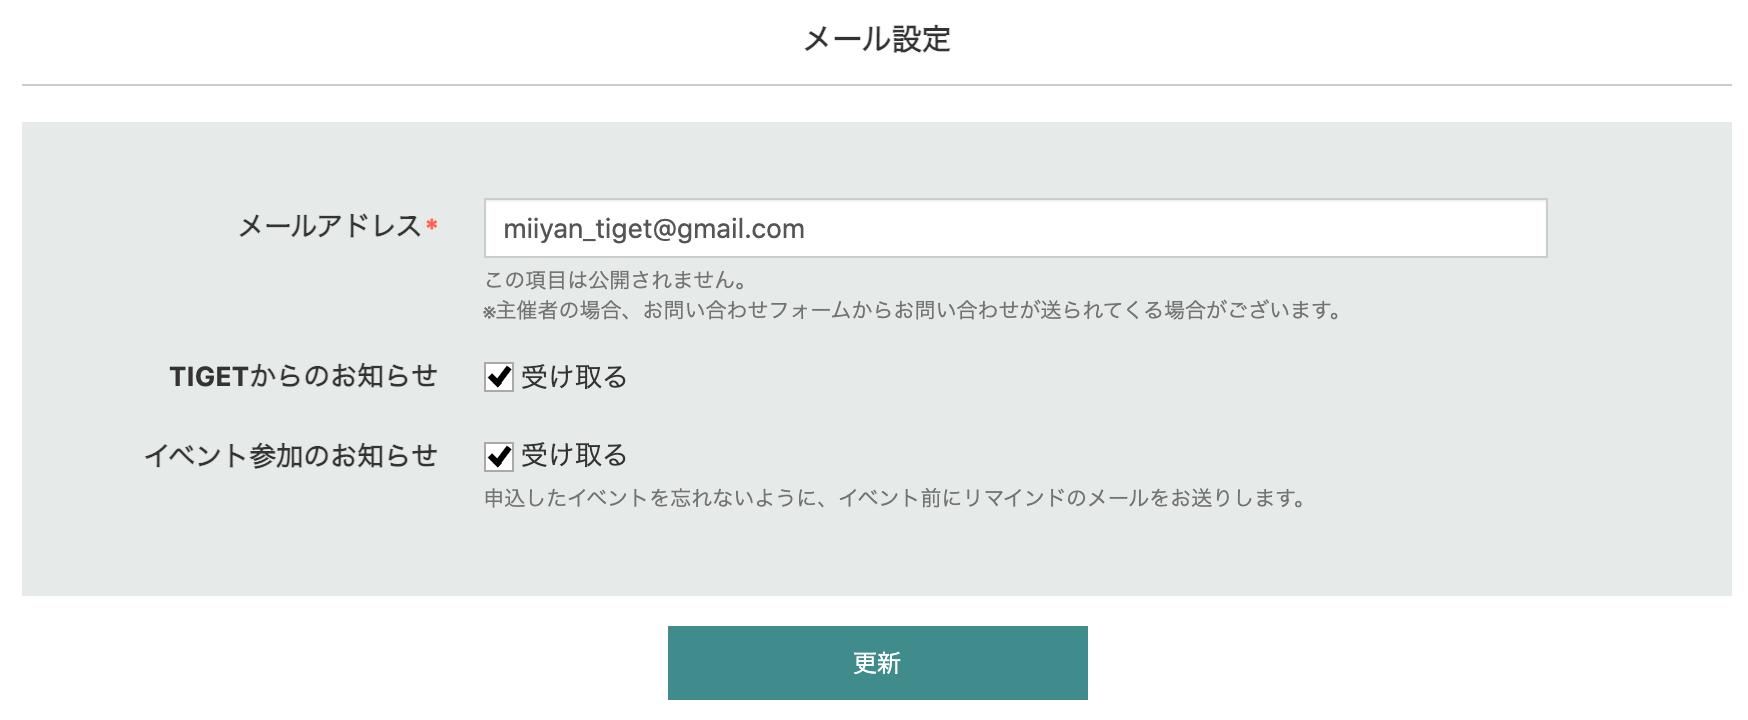 tiget_adress.png